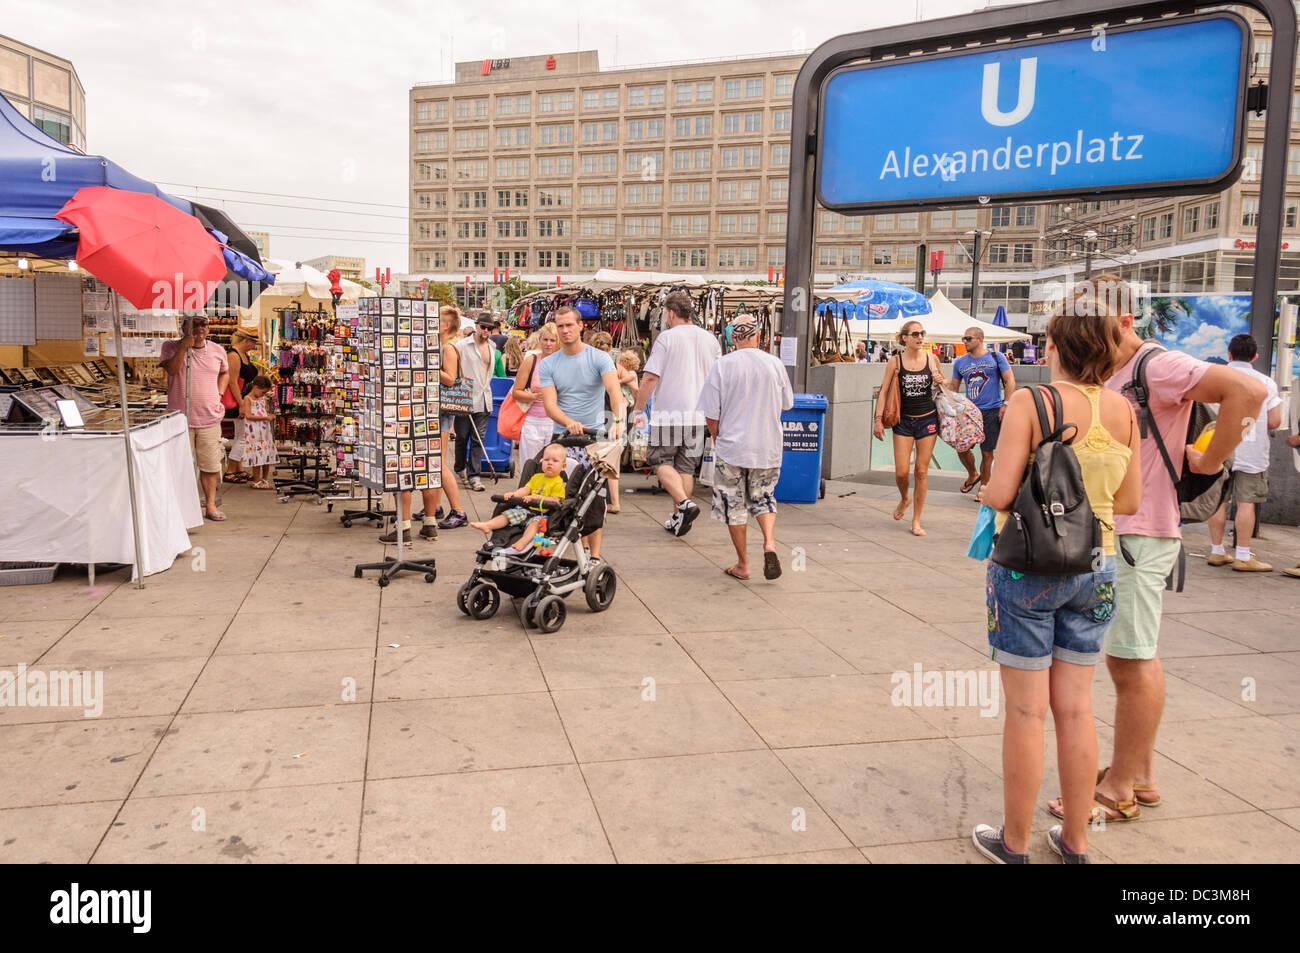 Streetmarket on Berlin Alexanderplatz (Alex) in front of the U-Bahn (subway, underground) station - Stock Image